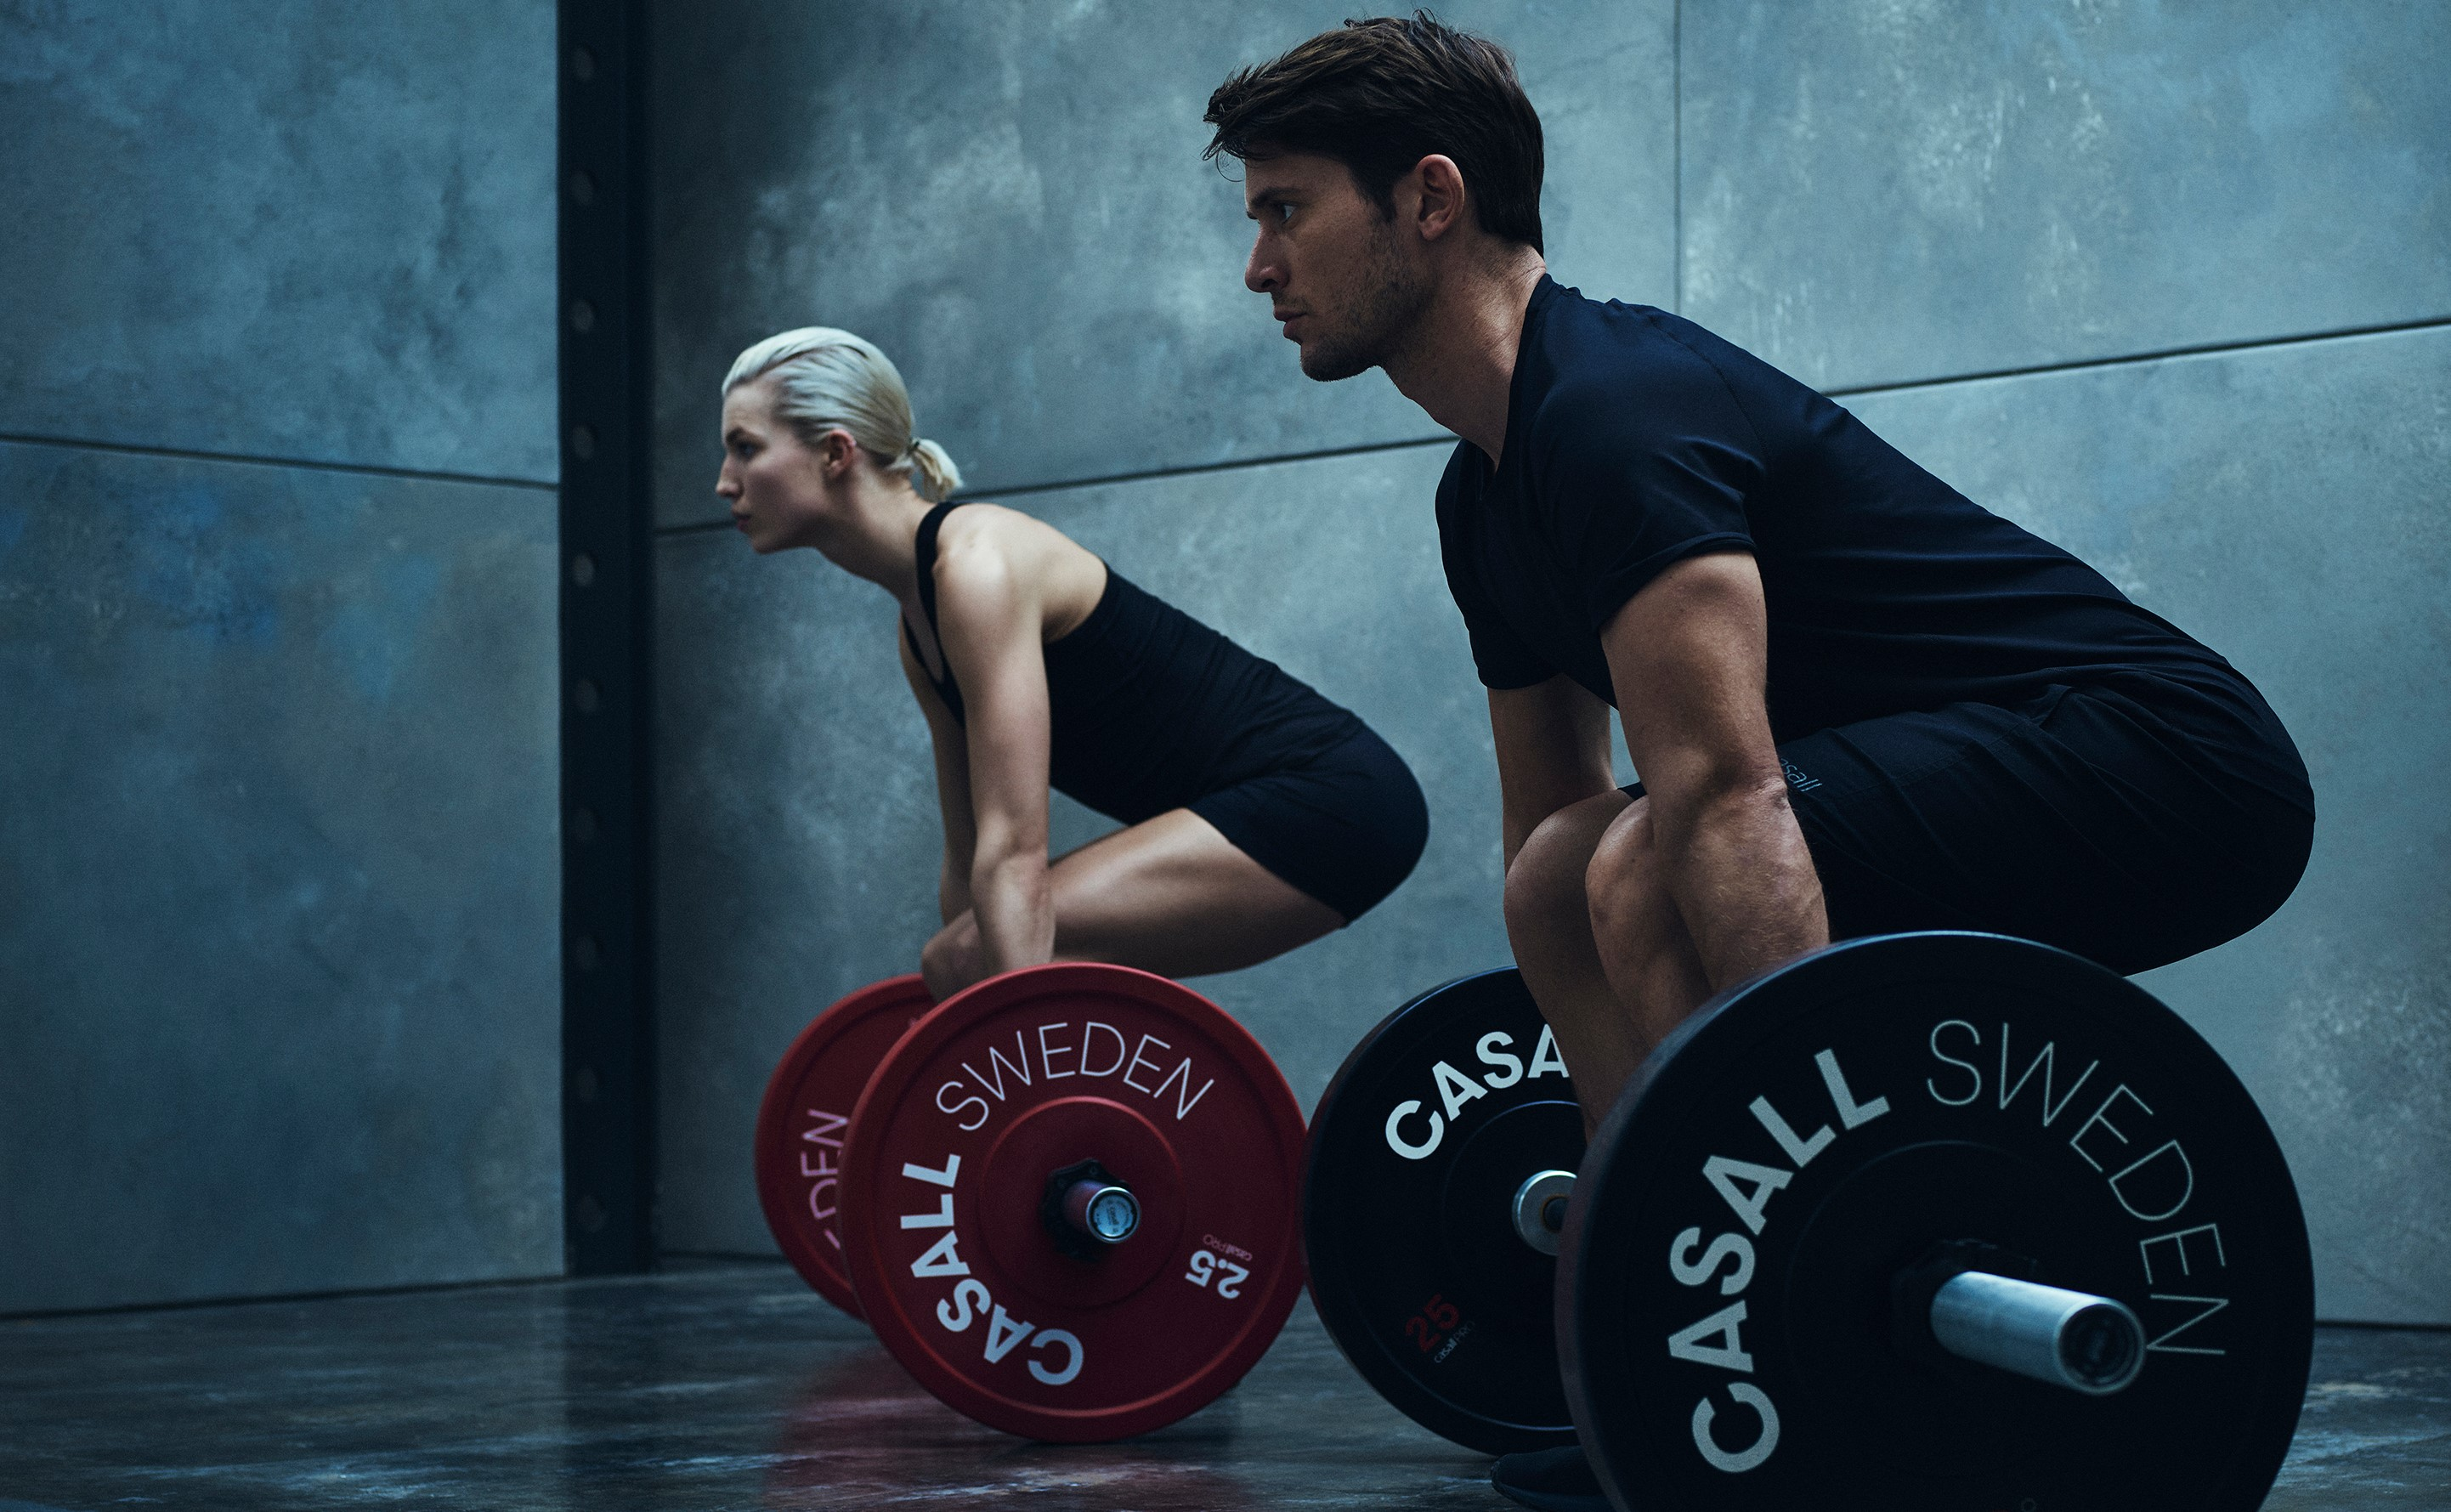 treningsutstyr gymutstyr styrke styrketrening casall pro casall professional matrix fitness trening gym